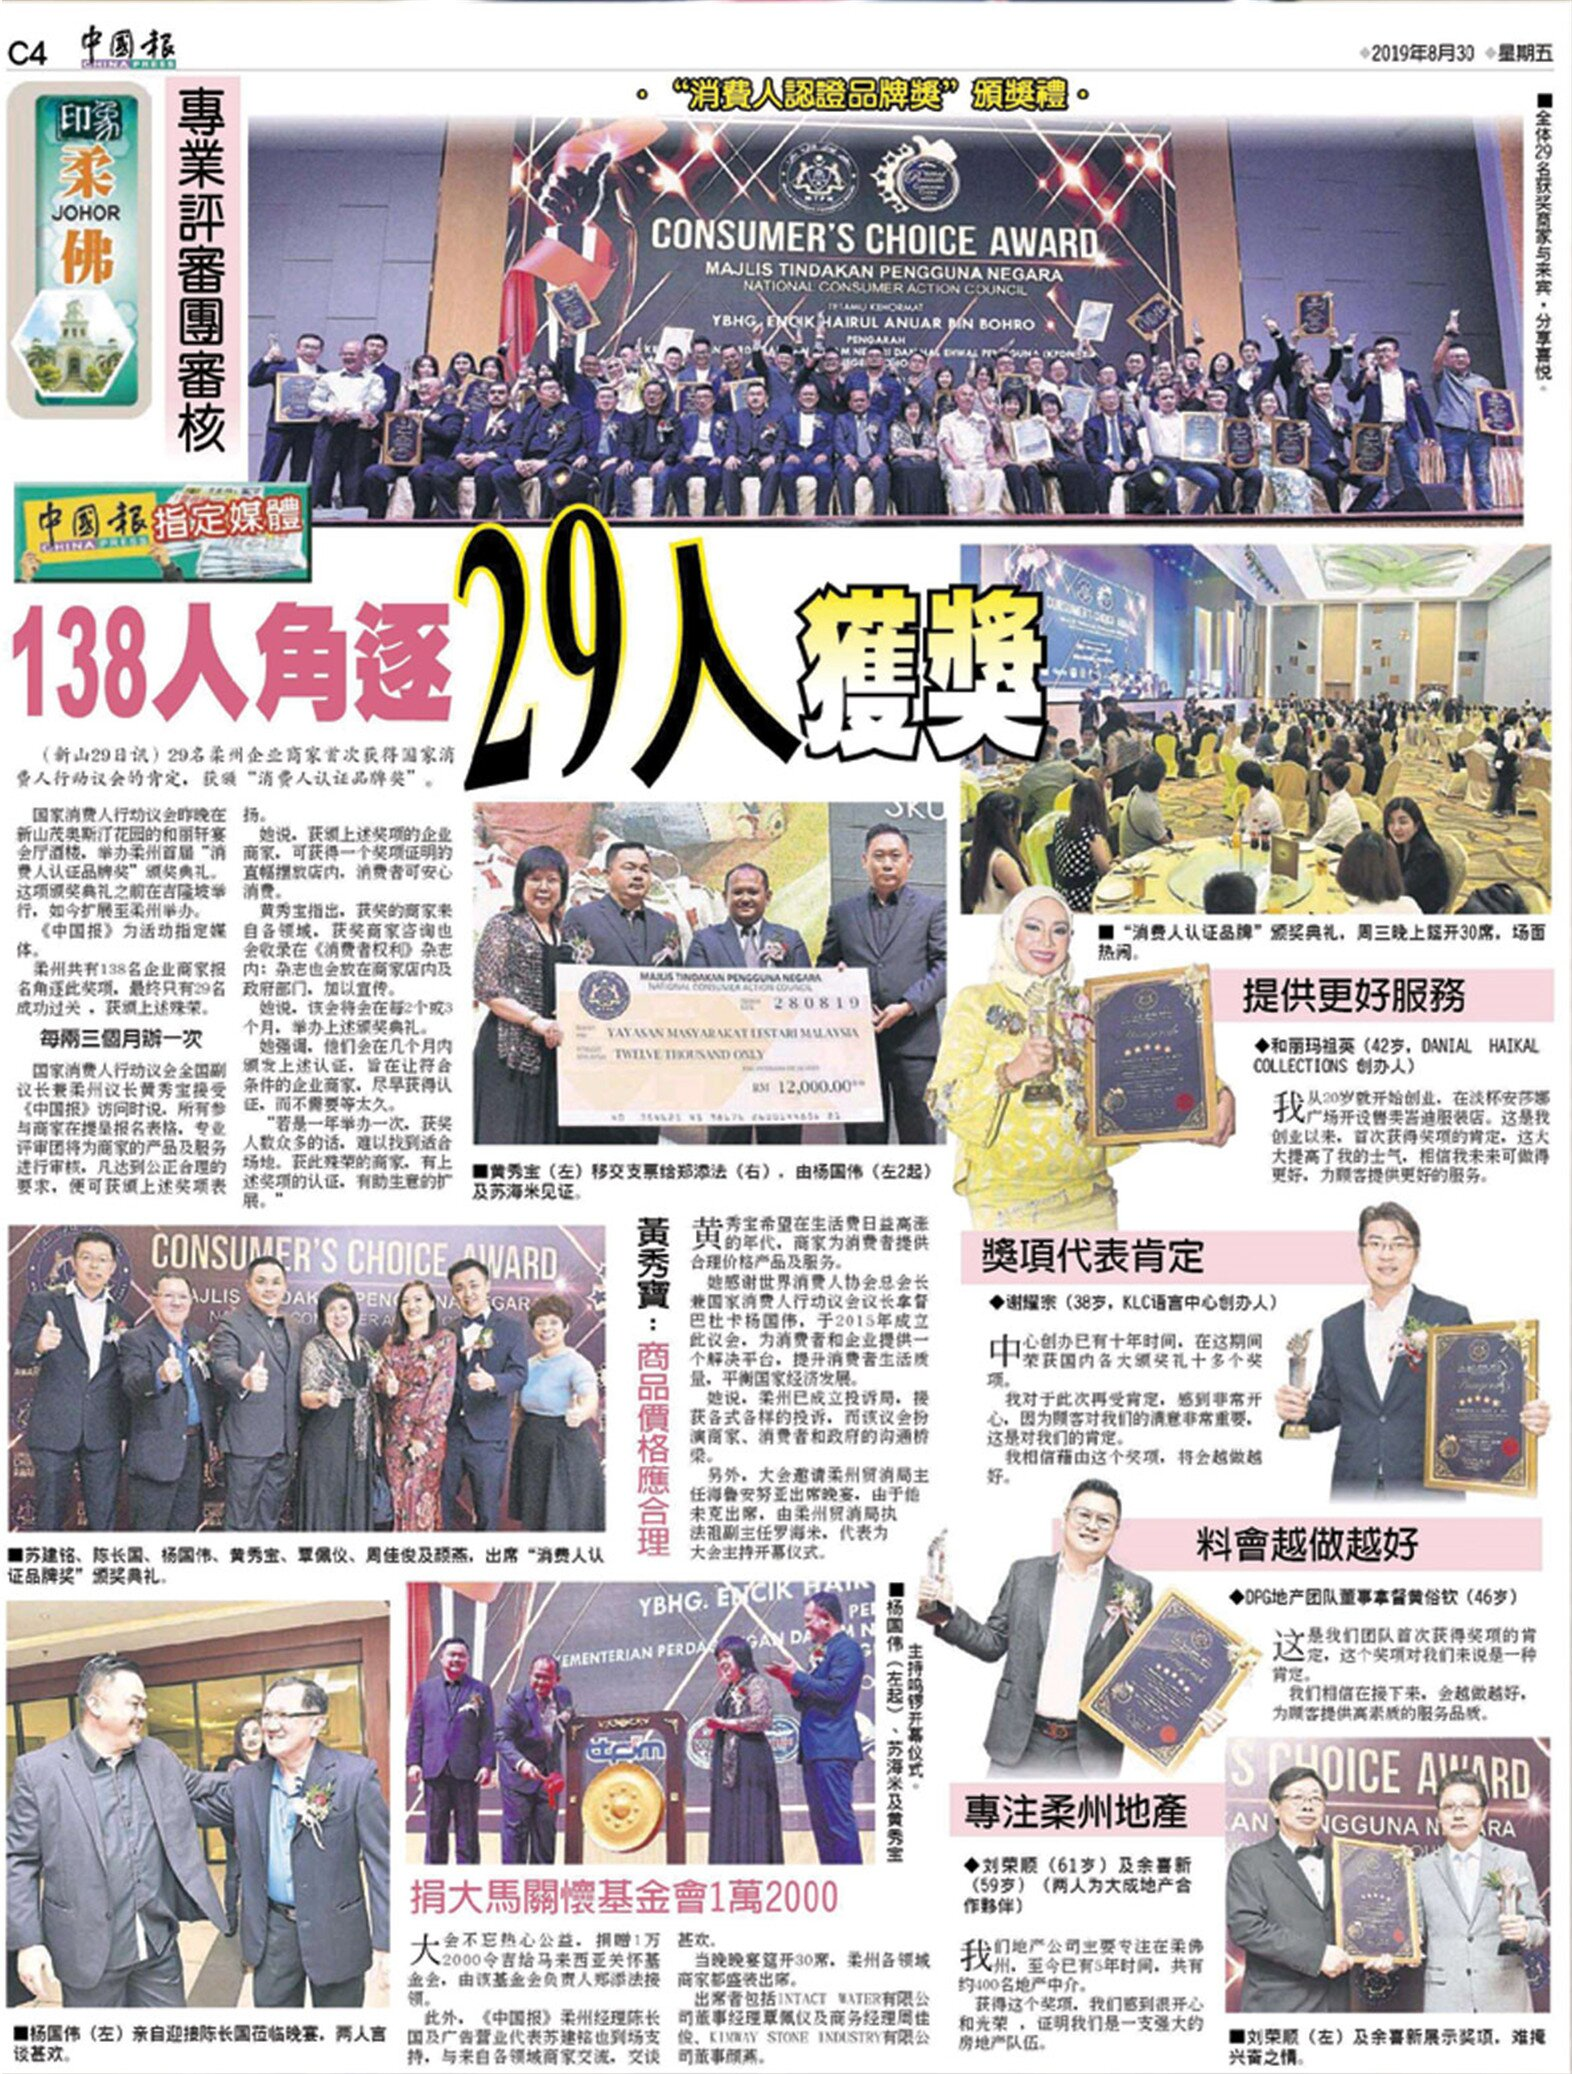 KLC EDUCATION GROUP于2015年起频频获得各界肯定,荣获的奖项包括亚洲诚信大奖